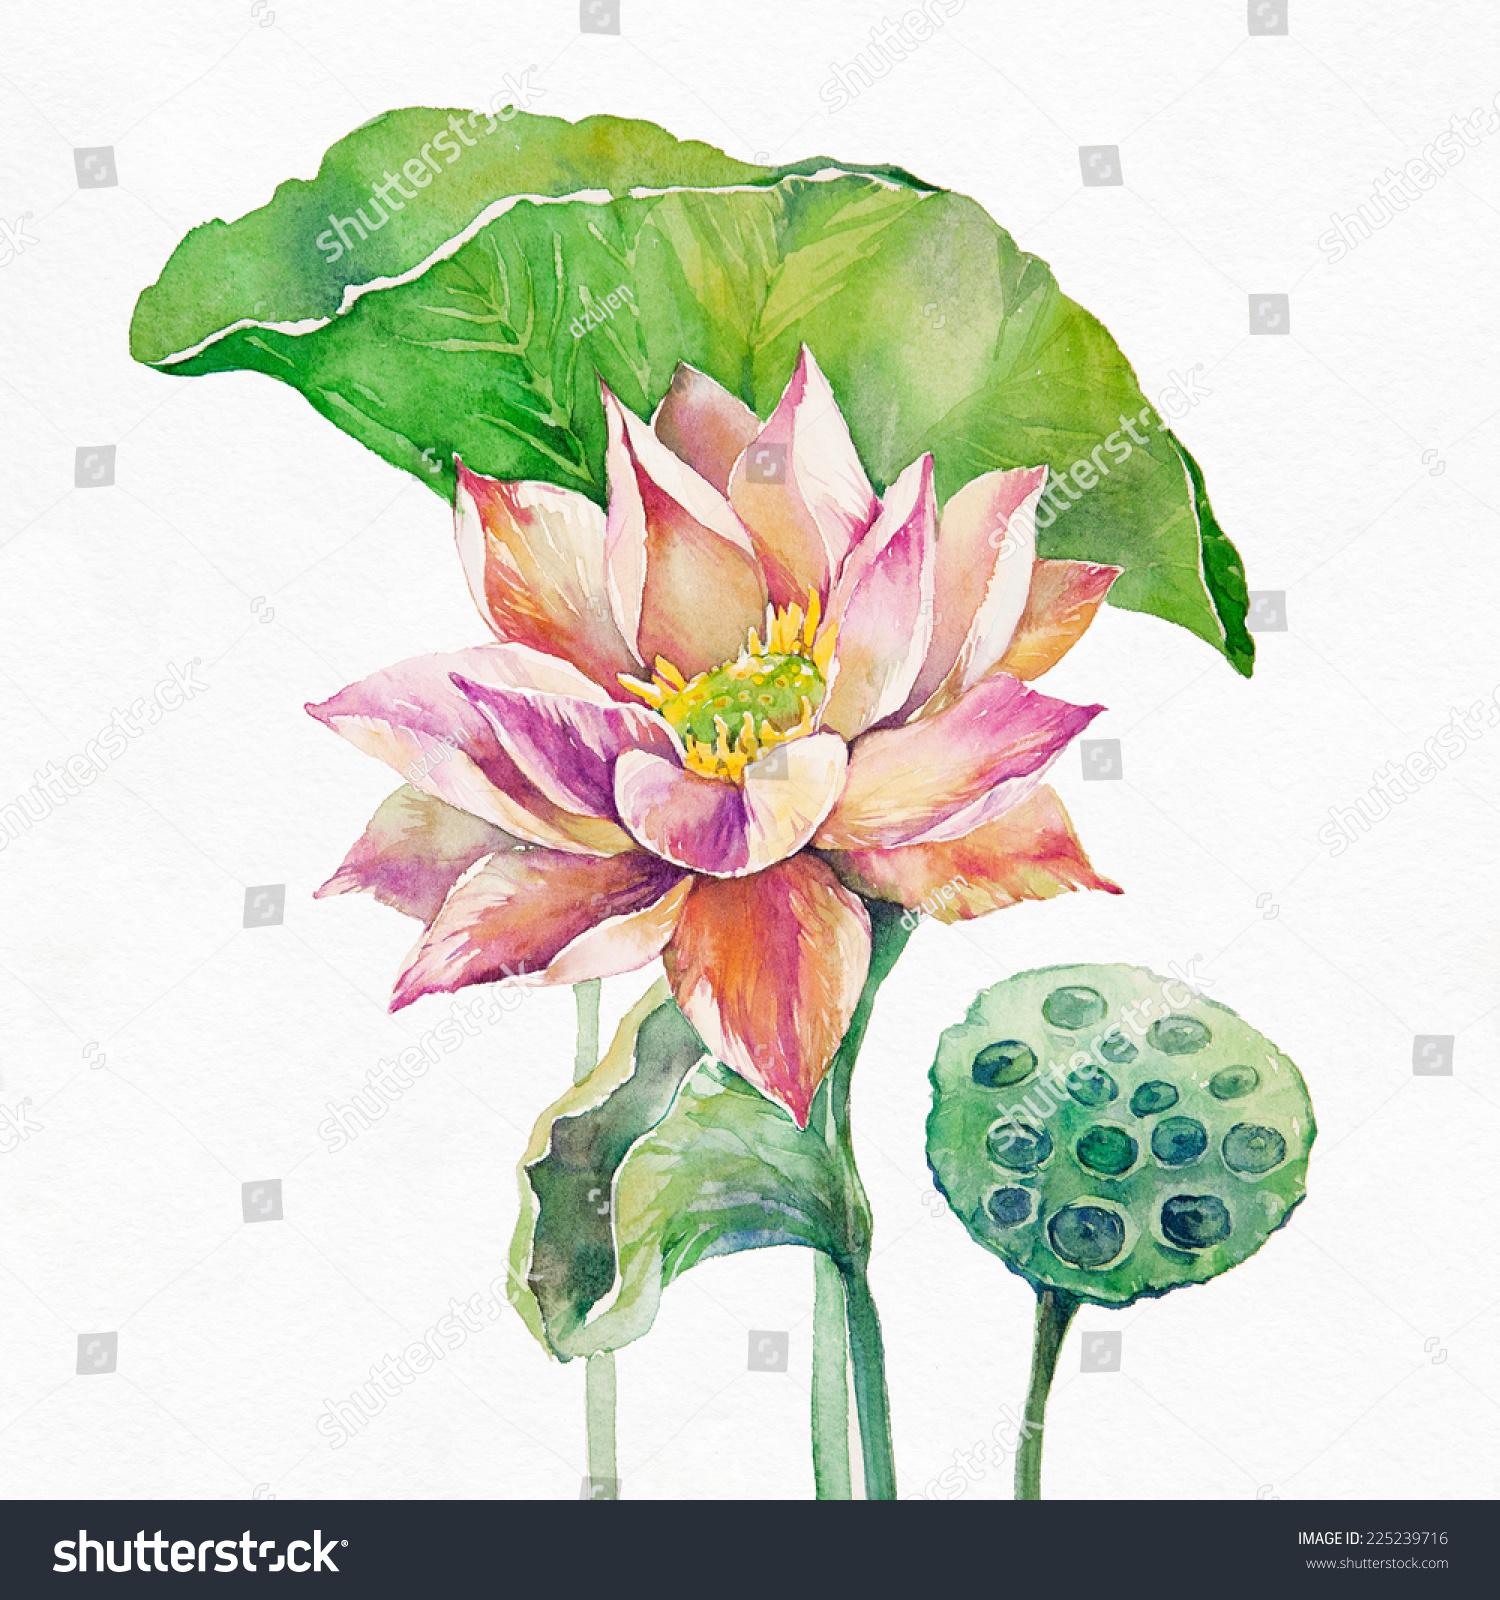 Lotus Flower Seed Pod Watercolor Illustration Stock Illustration